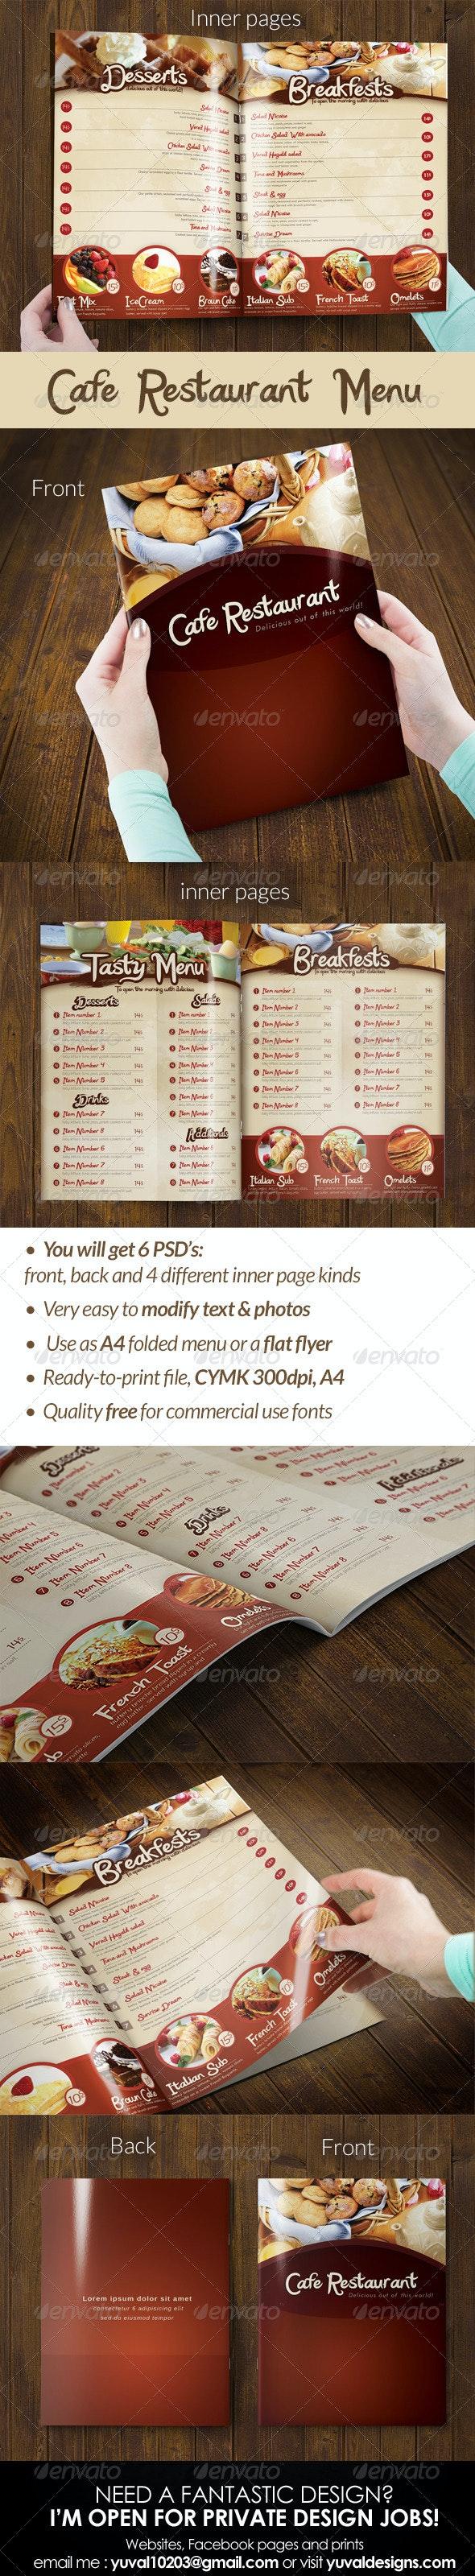 Cafe Restaurant Menu - Food Menus Print Templates